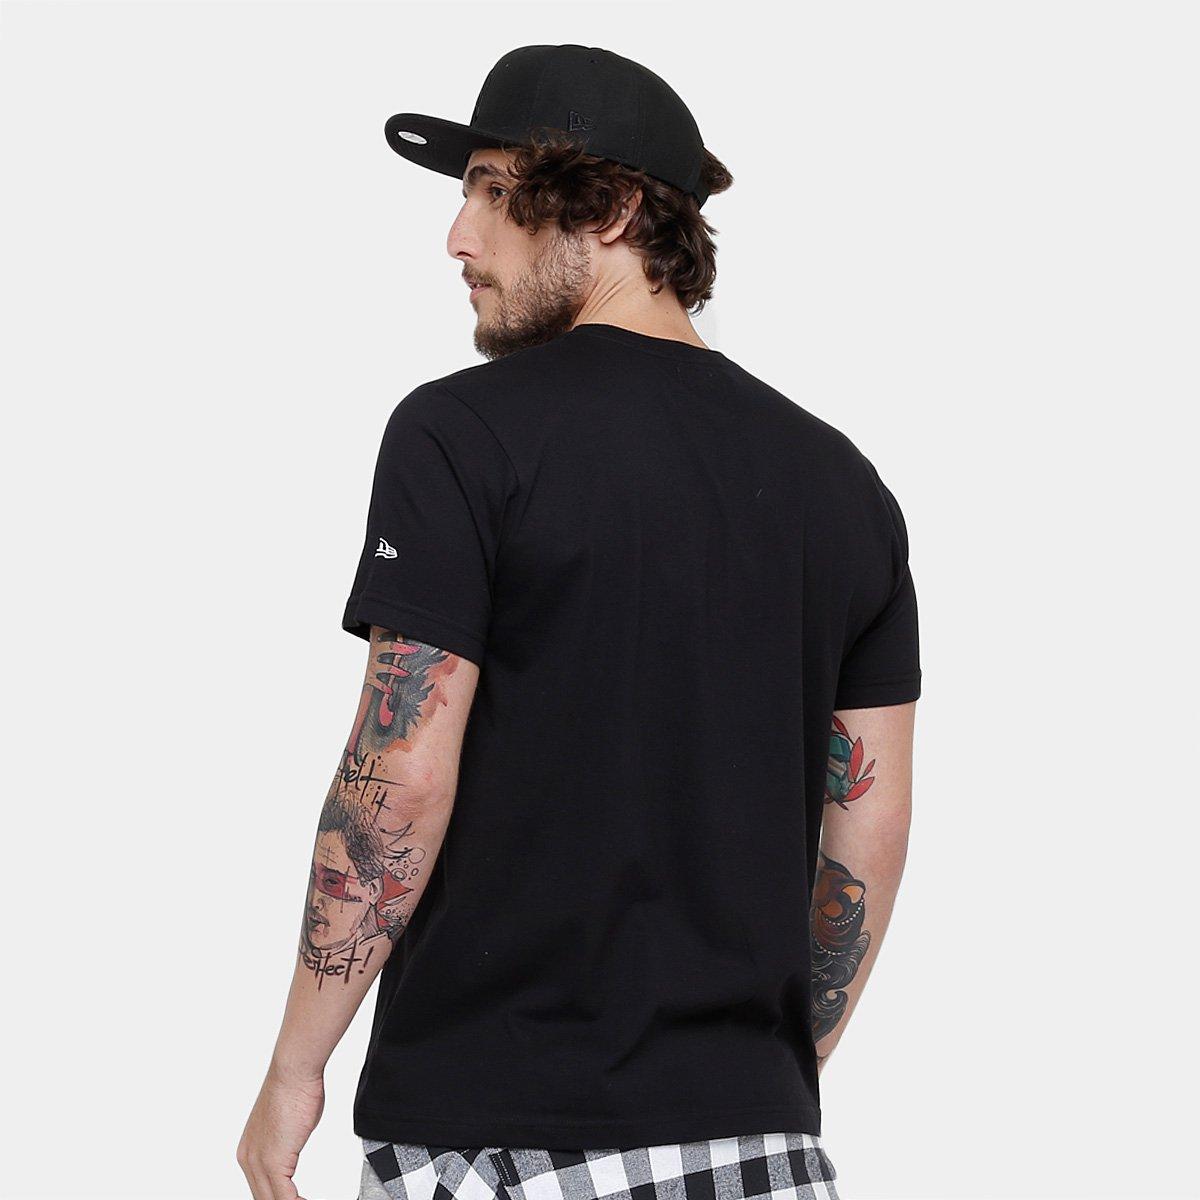 Camiseta MLB New York Yankees New Era 11 Team Masculina - Compre ... f047dcc4d24